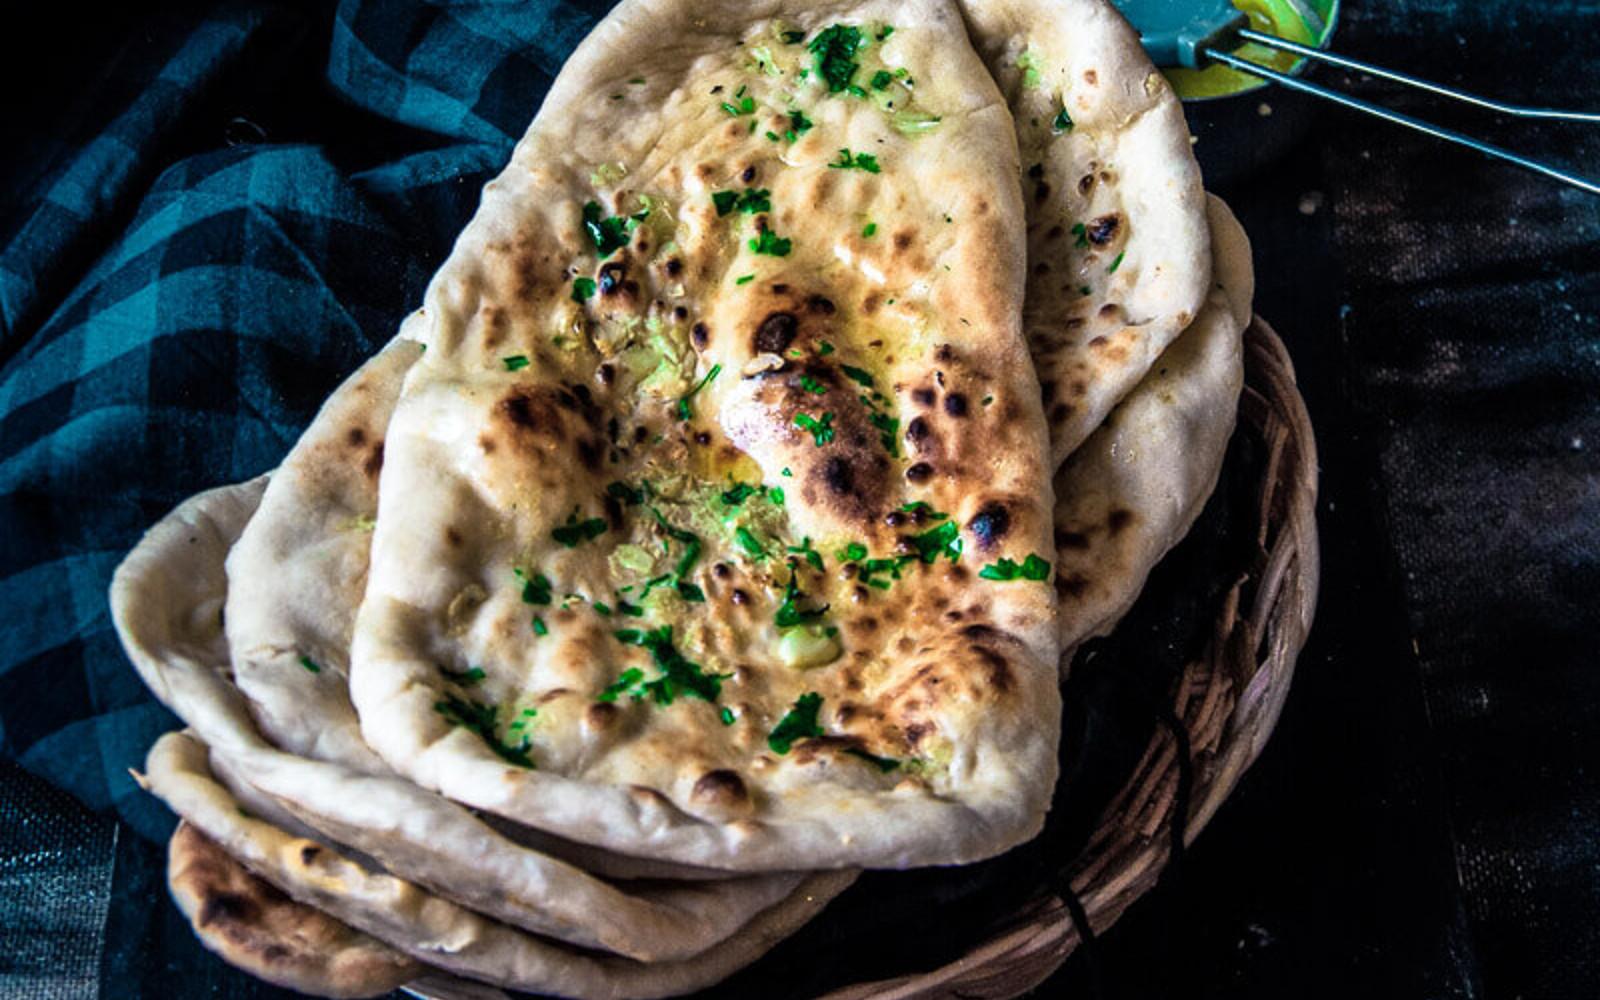 Vegan Restaurant-Style Garlic Naan